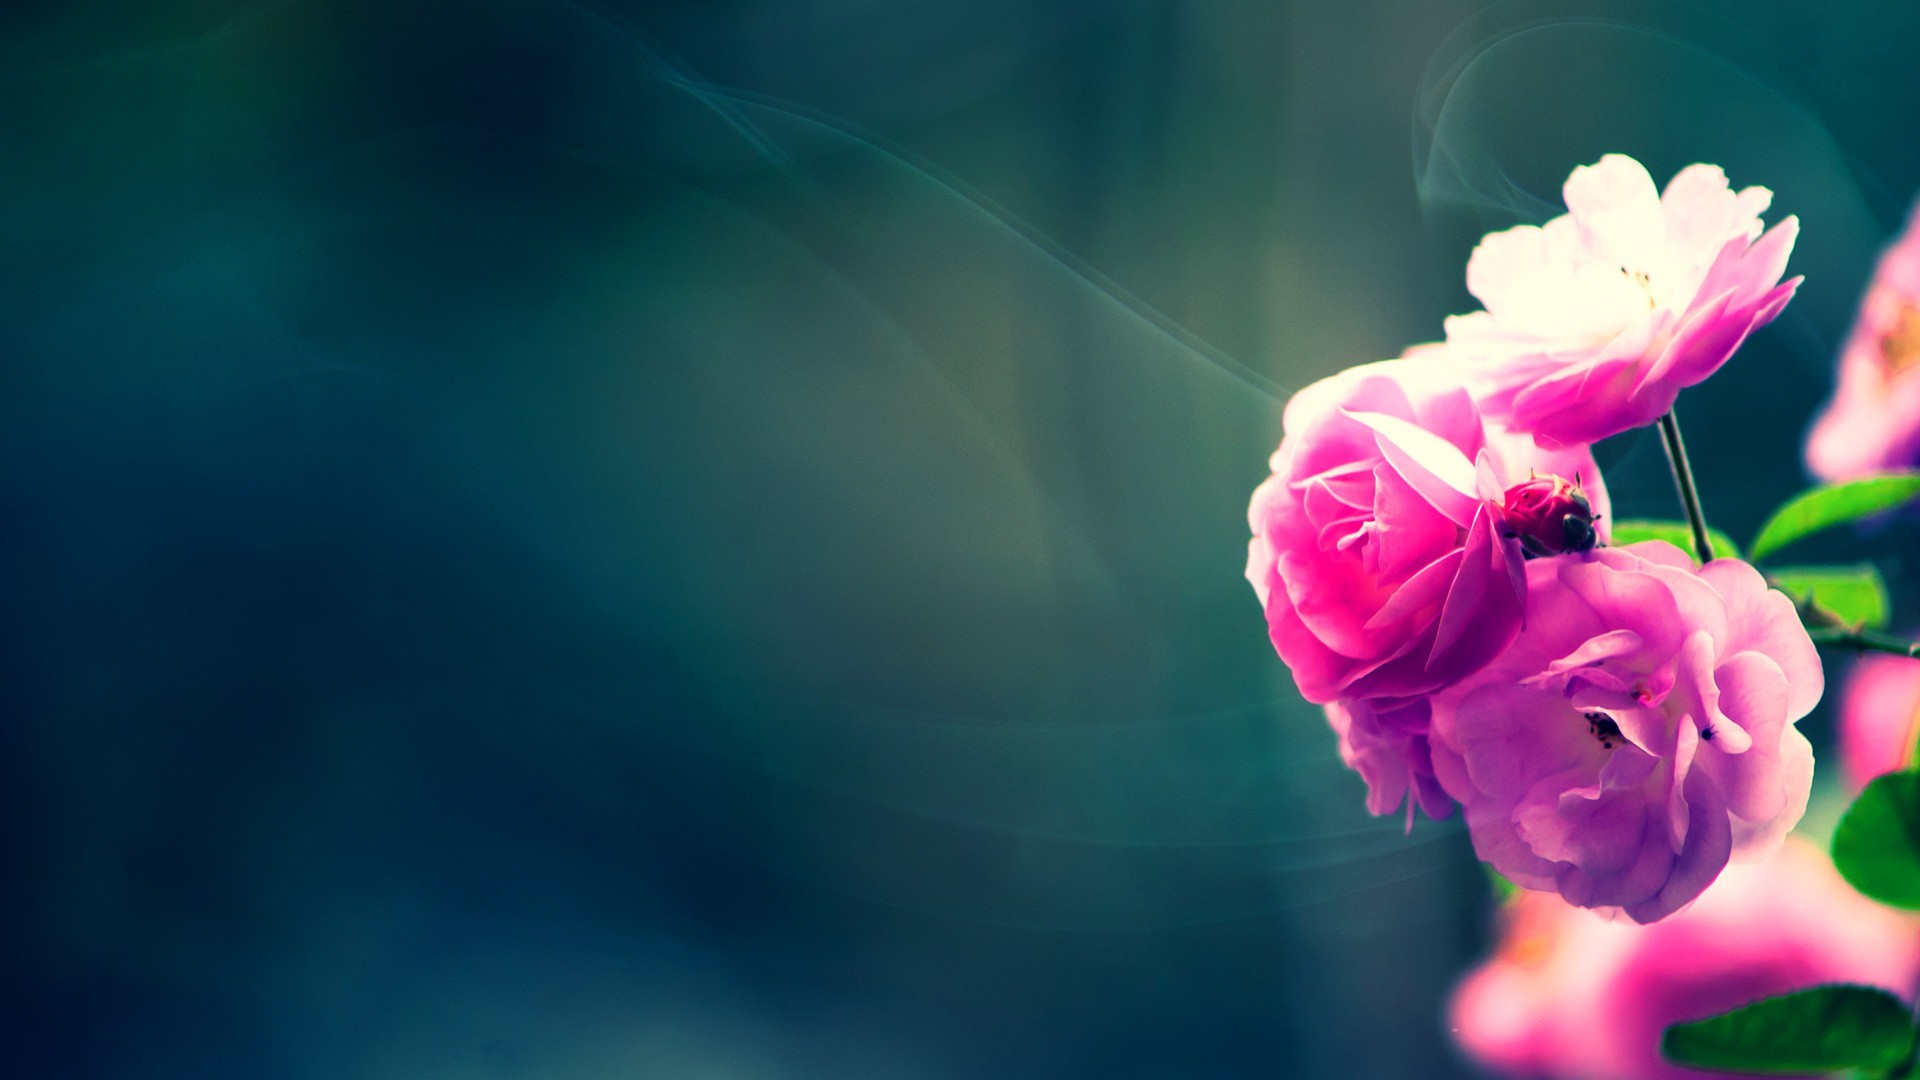 Full HD p Flowers Wallpapers, Desktop Backgrounds HD, Pictures Flower  Wallpaper Hd Wallpapers)